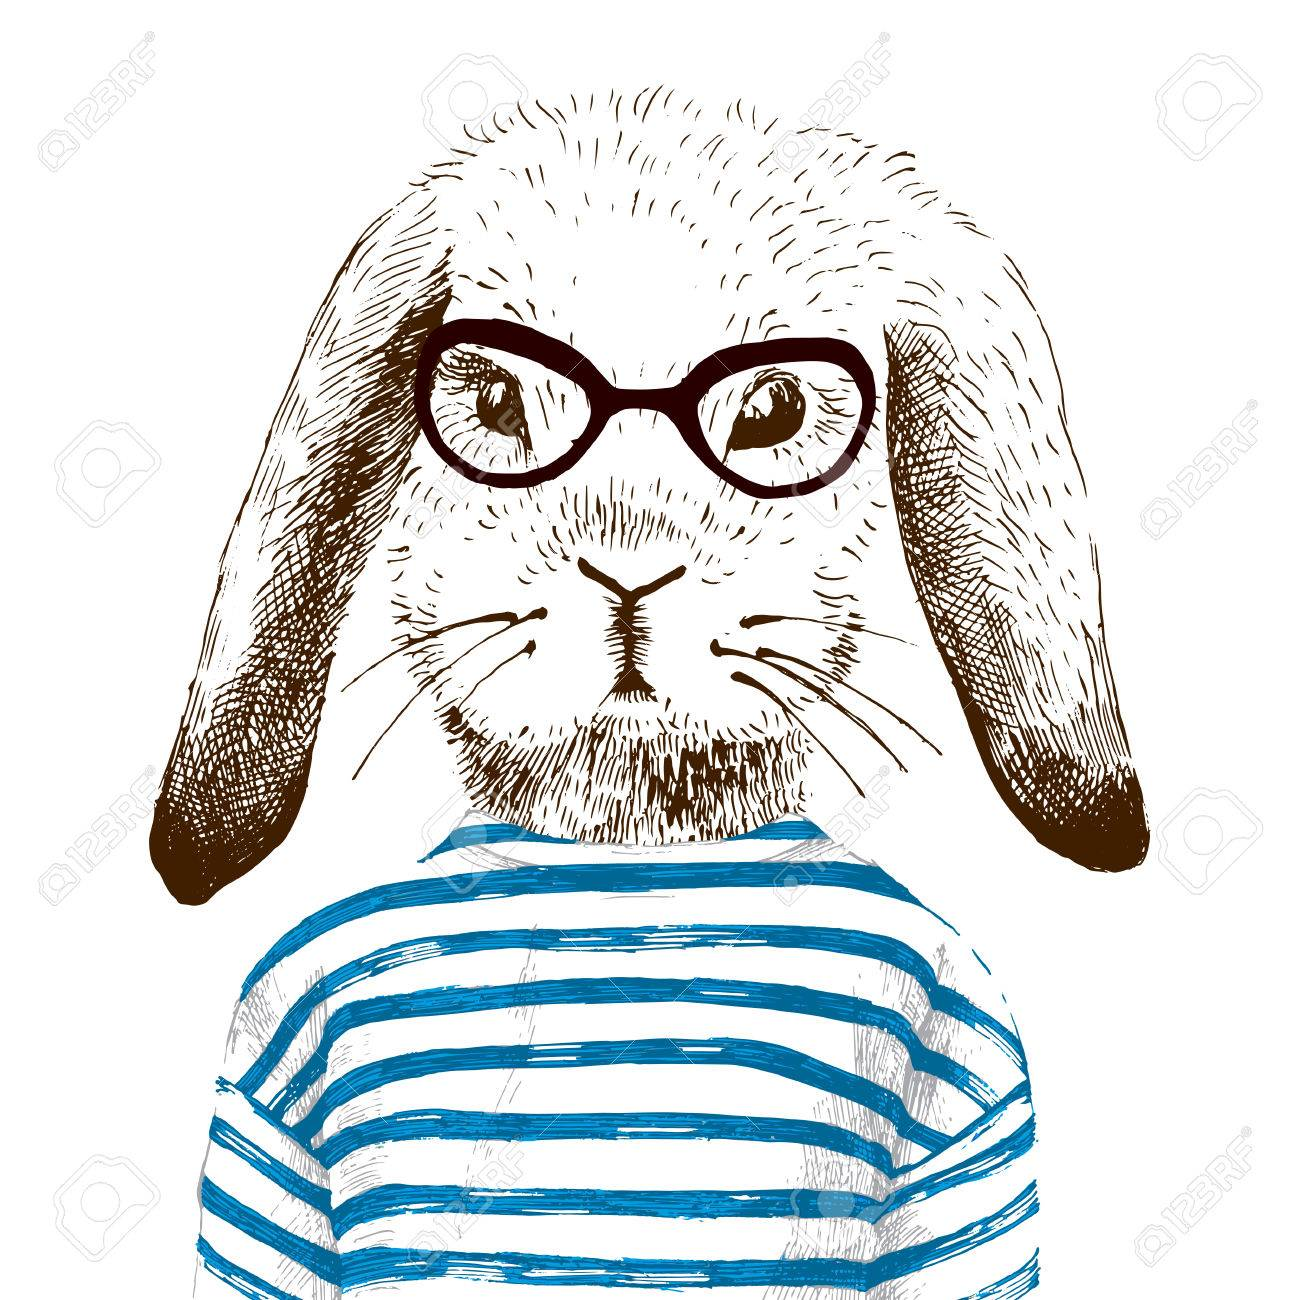 hand drawn illustration of dressed up bunny - 50463964